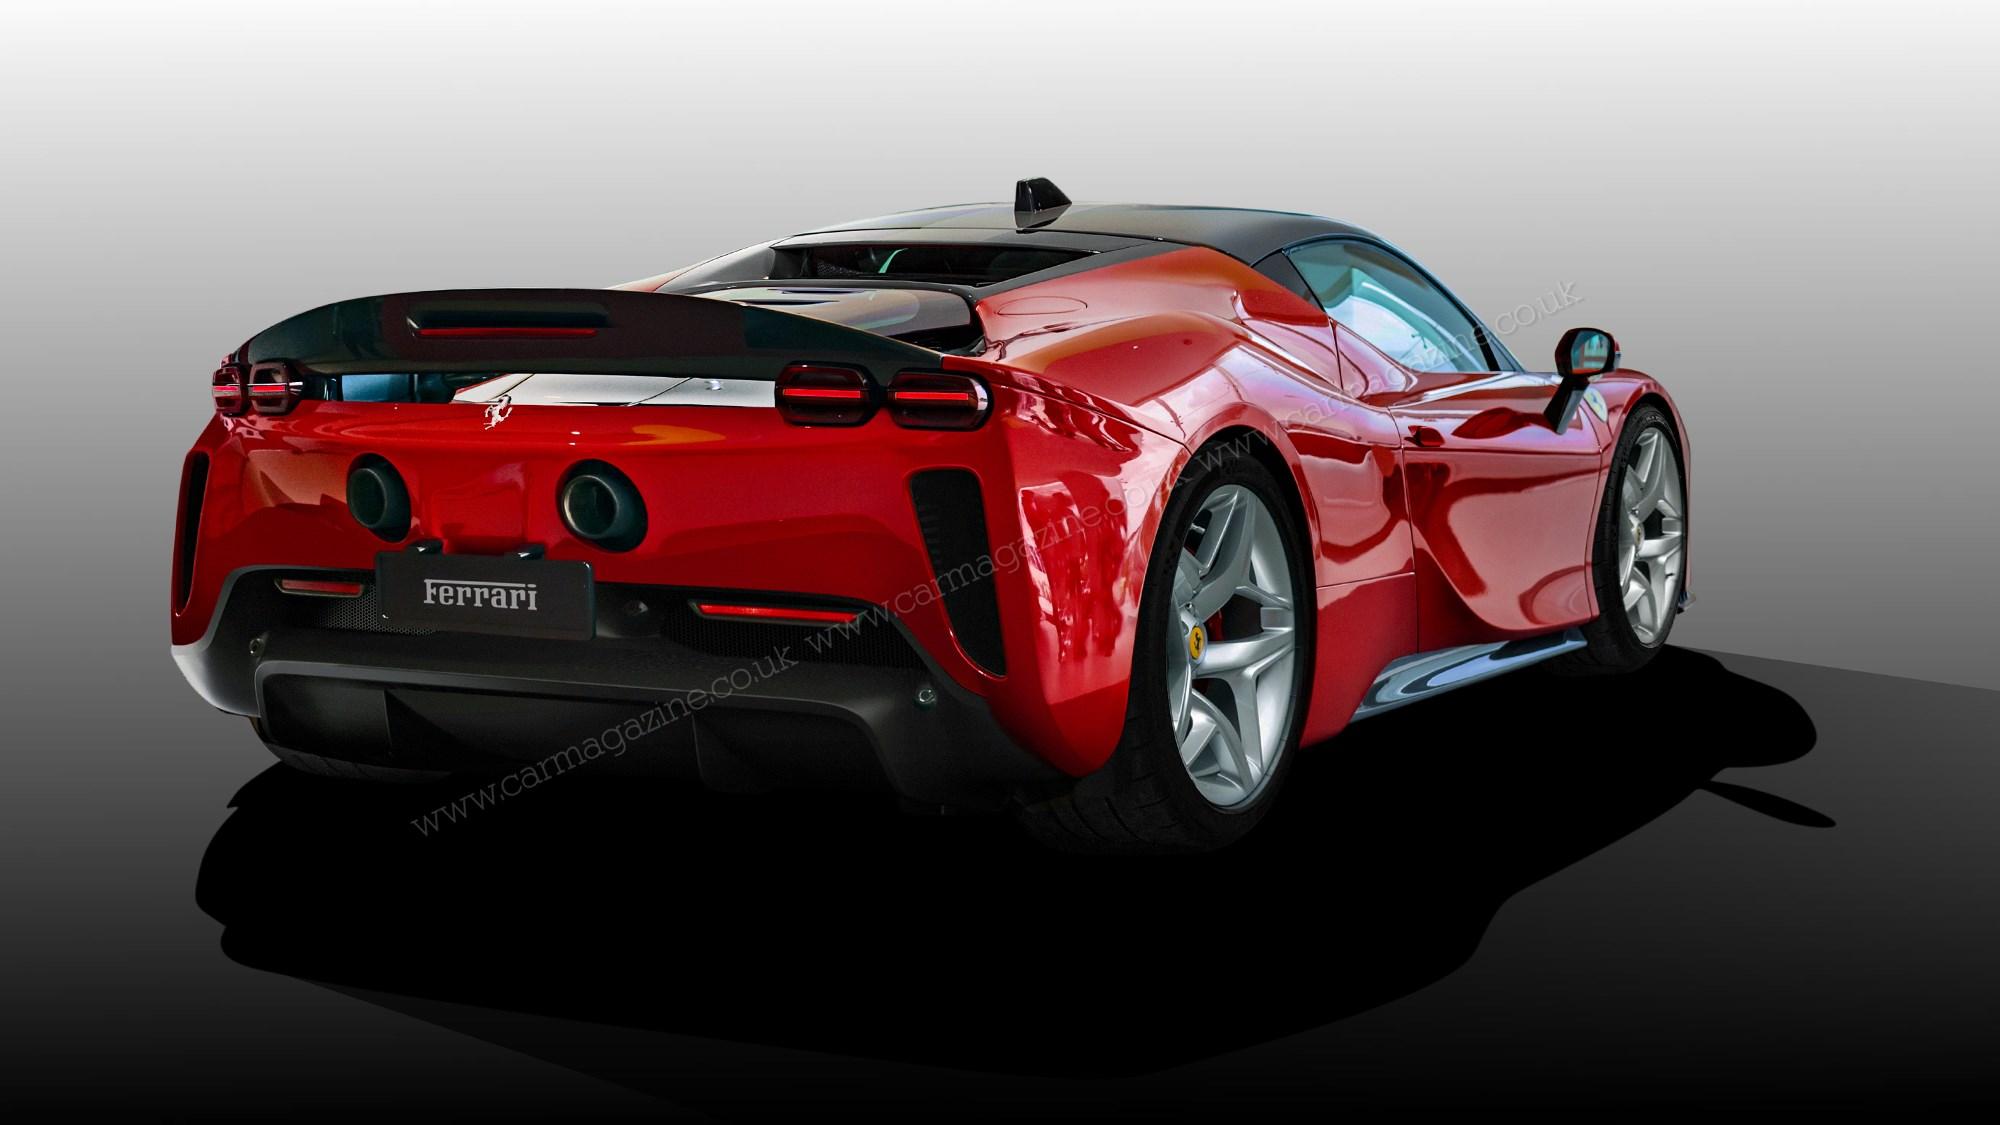 Ferrari F171 Hybrid Supercar Scooped What Would Enzo Say Car Magazine